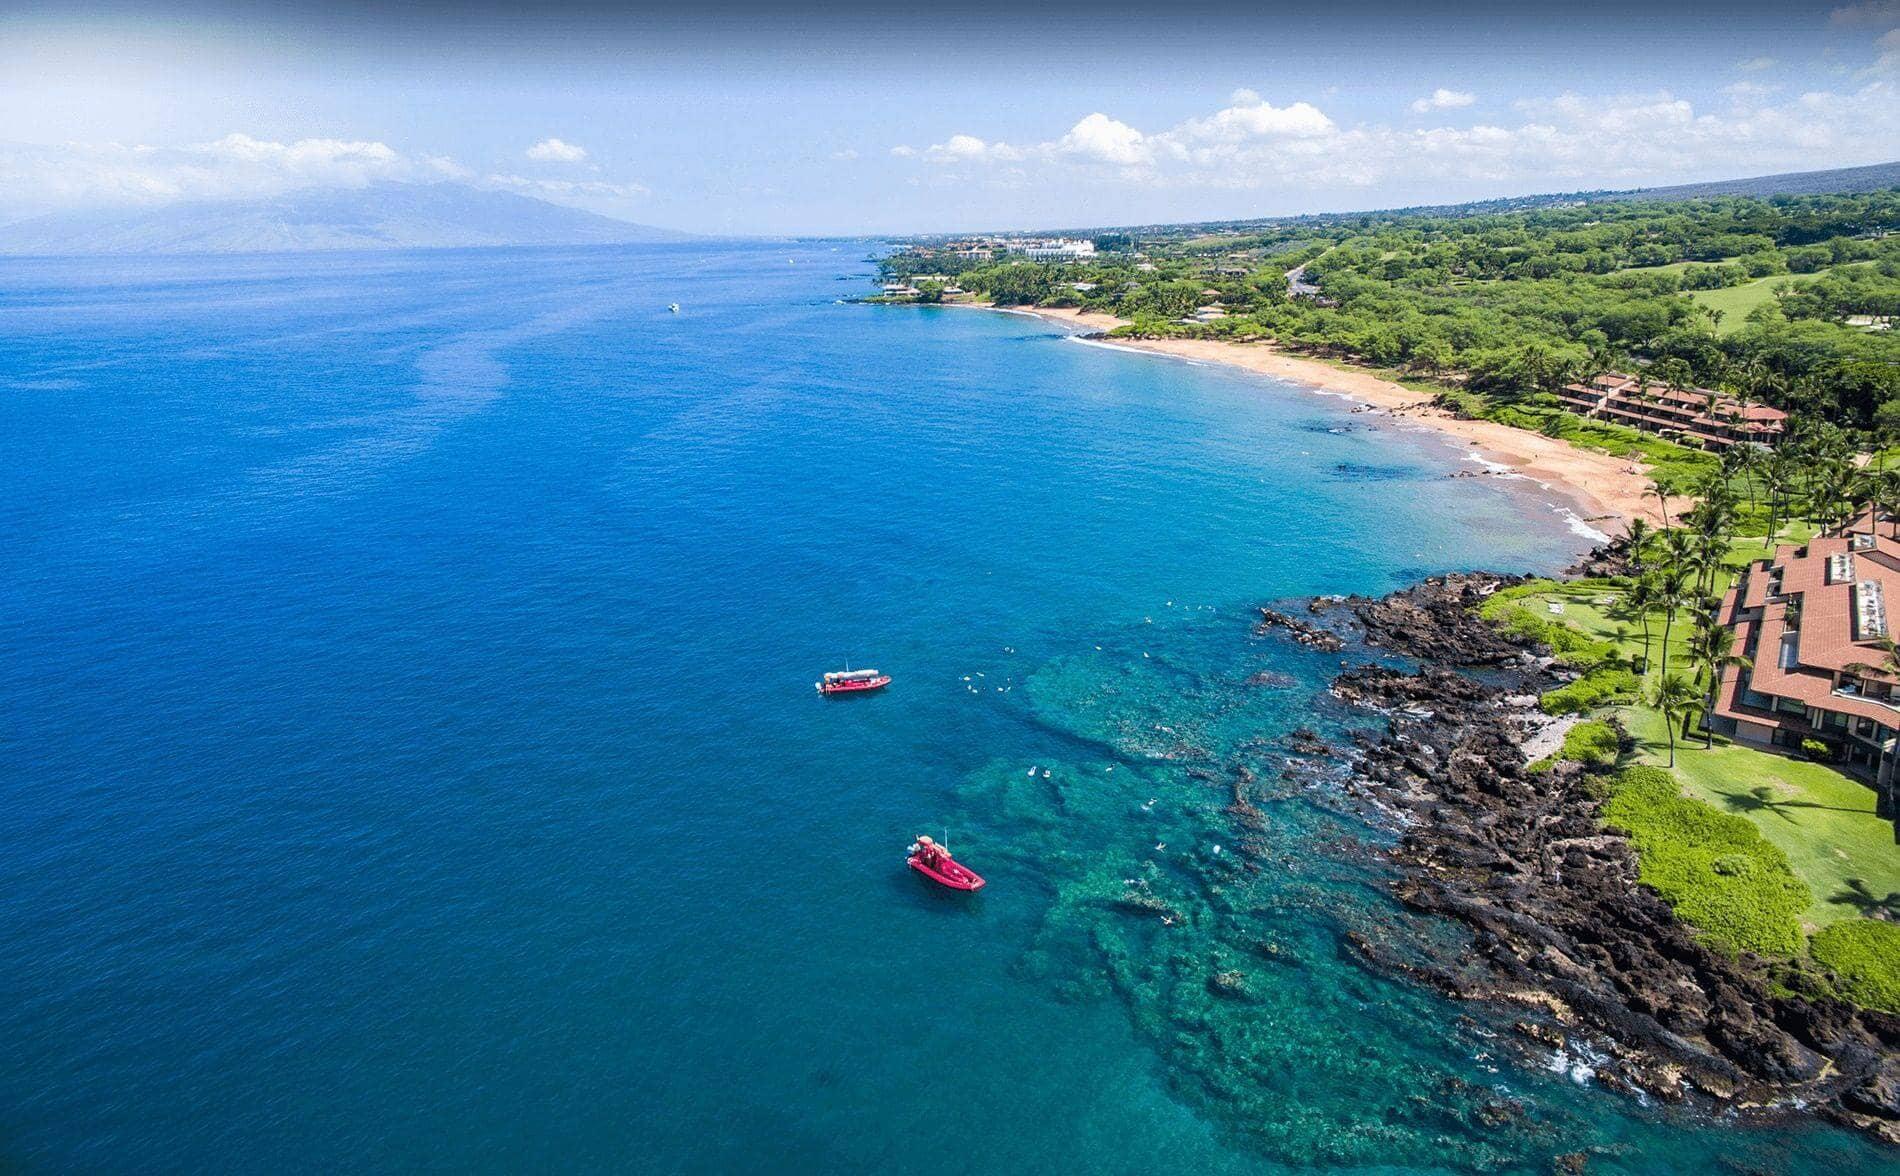 Maui Snorkel Tours Kihei